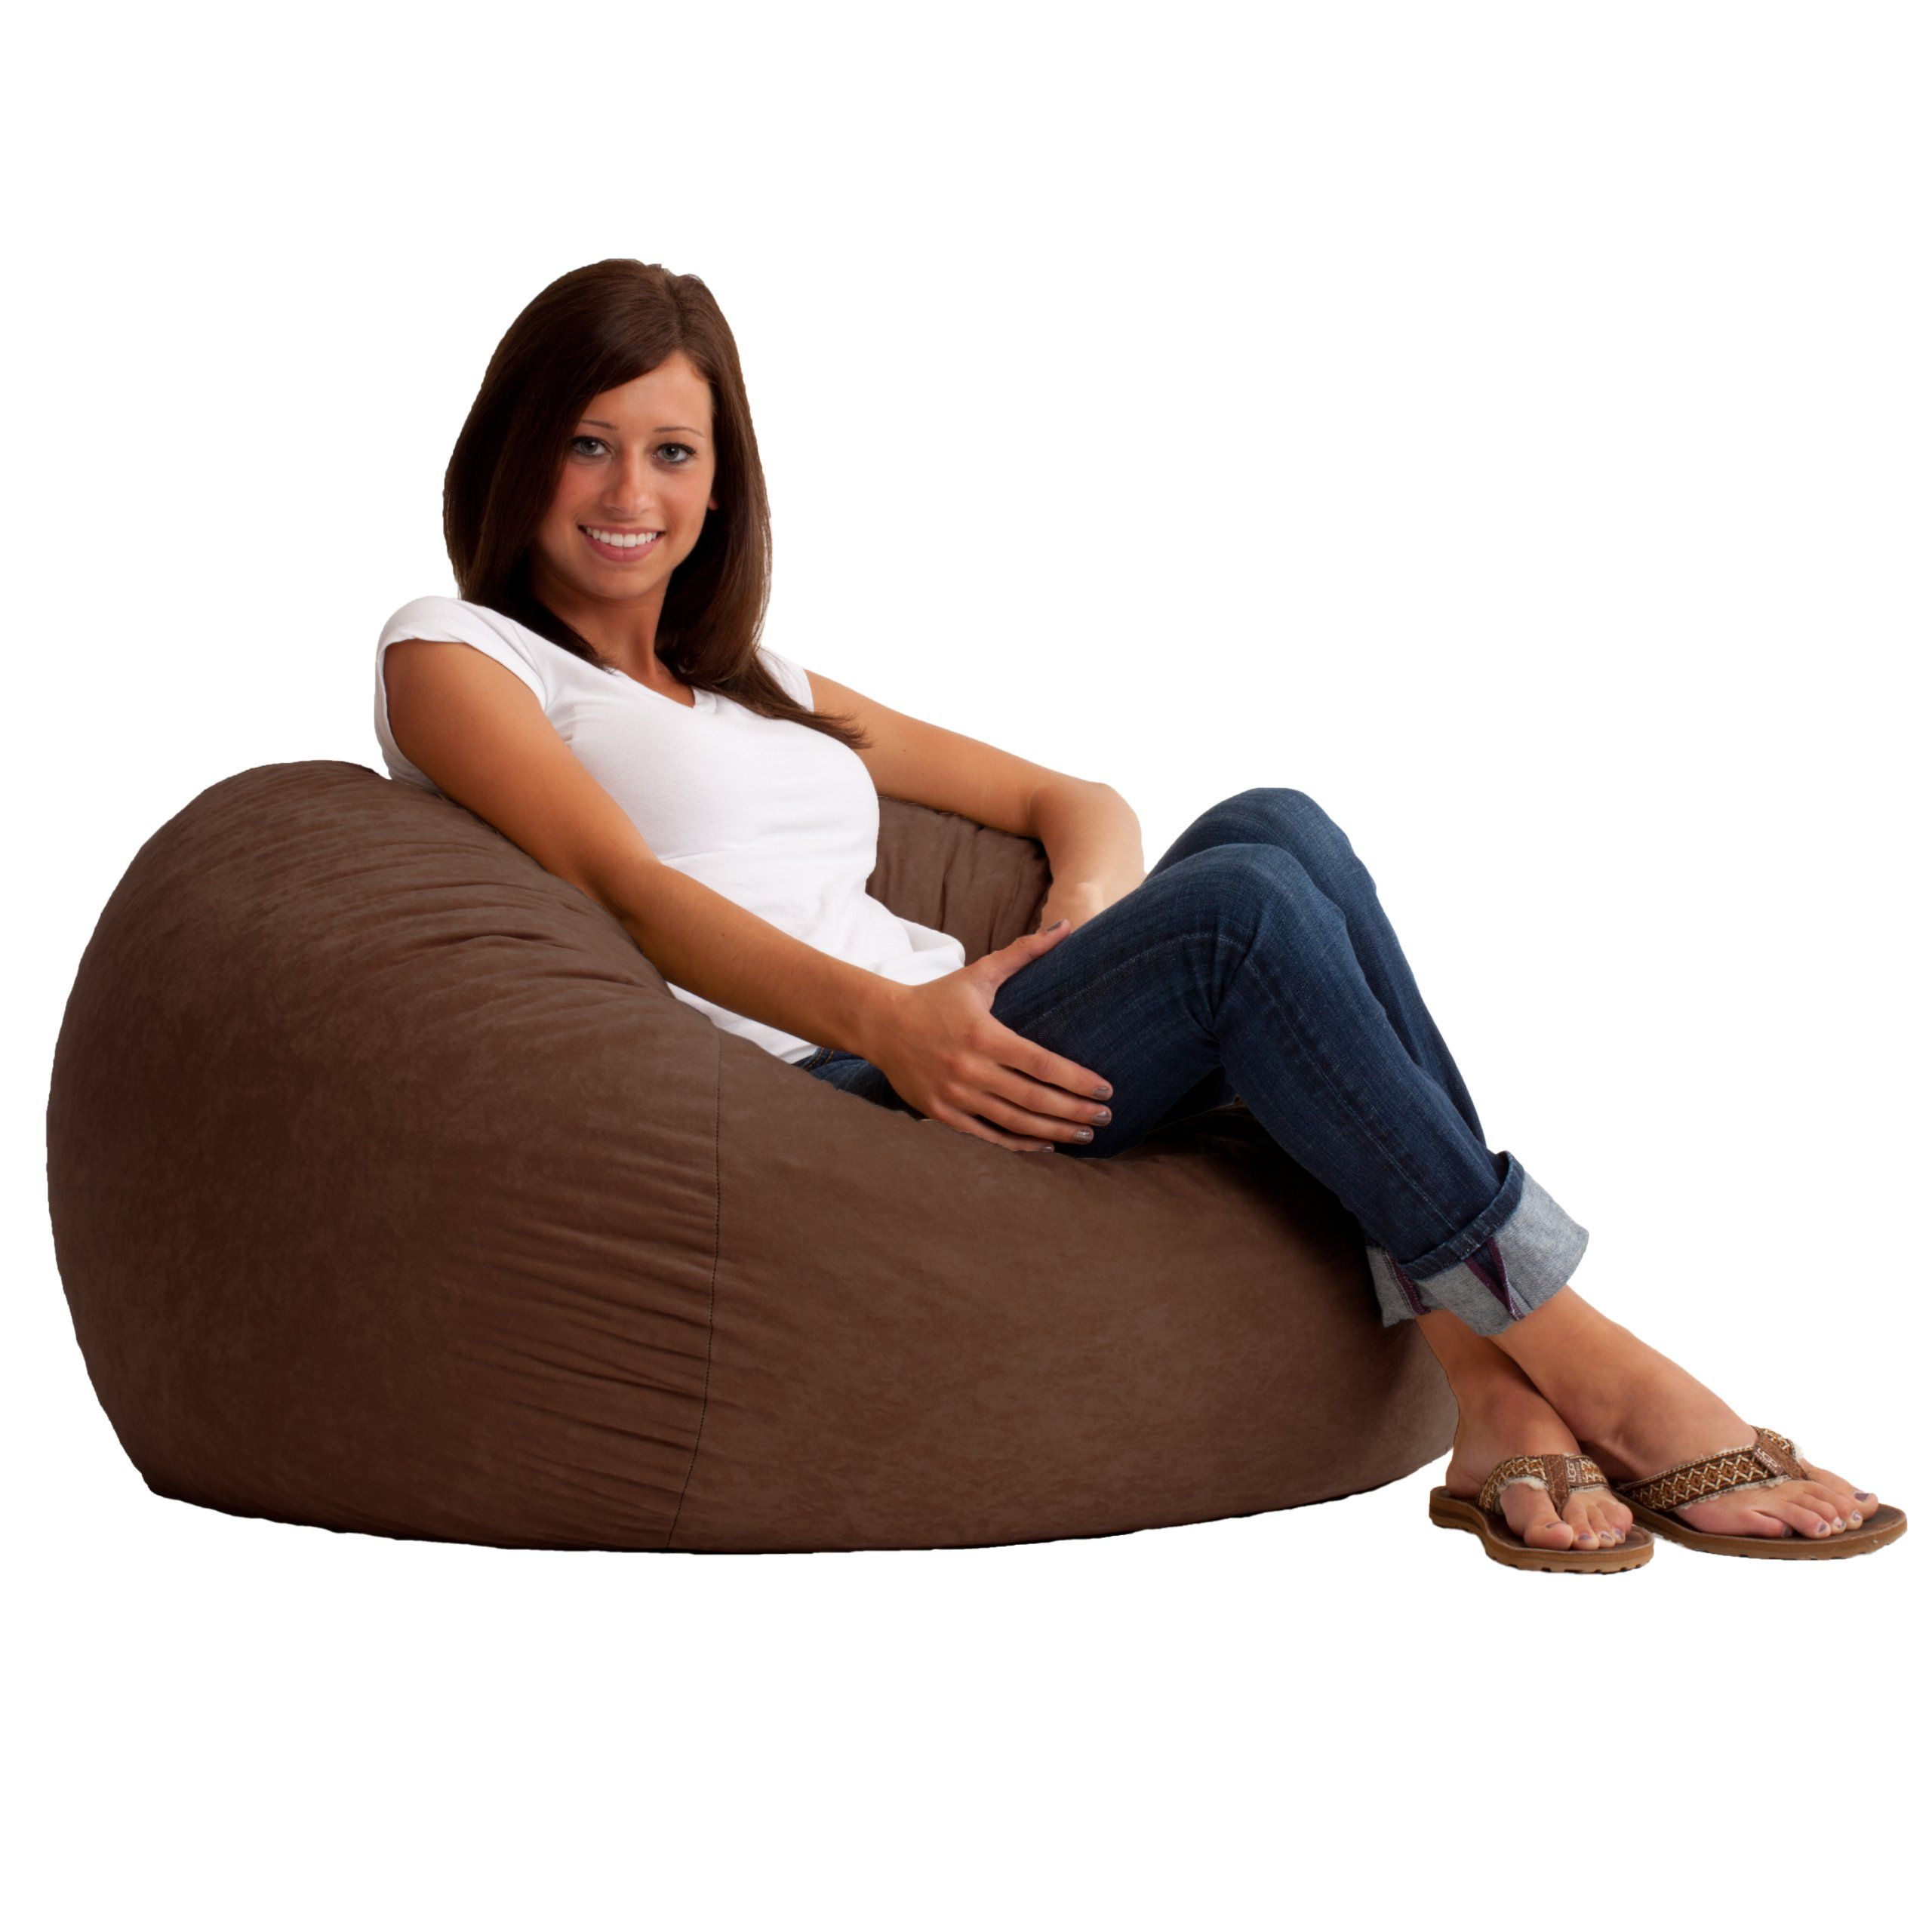 Awe Inspiring Amazon Com Comfort Research 3 Foot Fuf In Comfort Suede Cjindustries Chair Design For Home Cjindustriesco